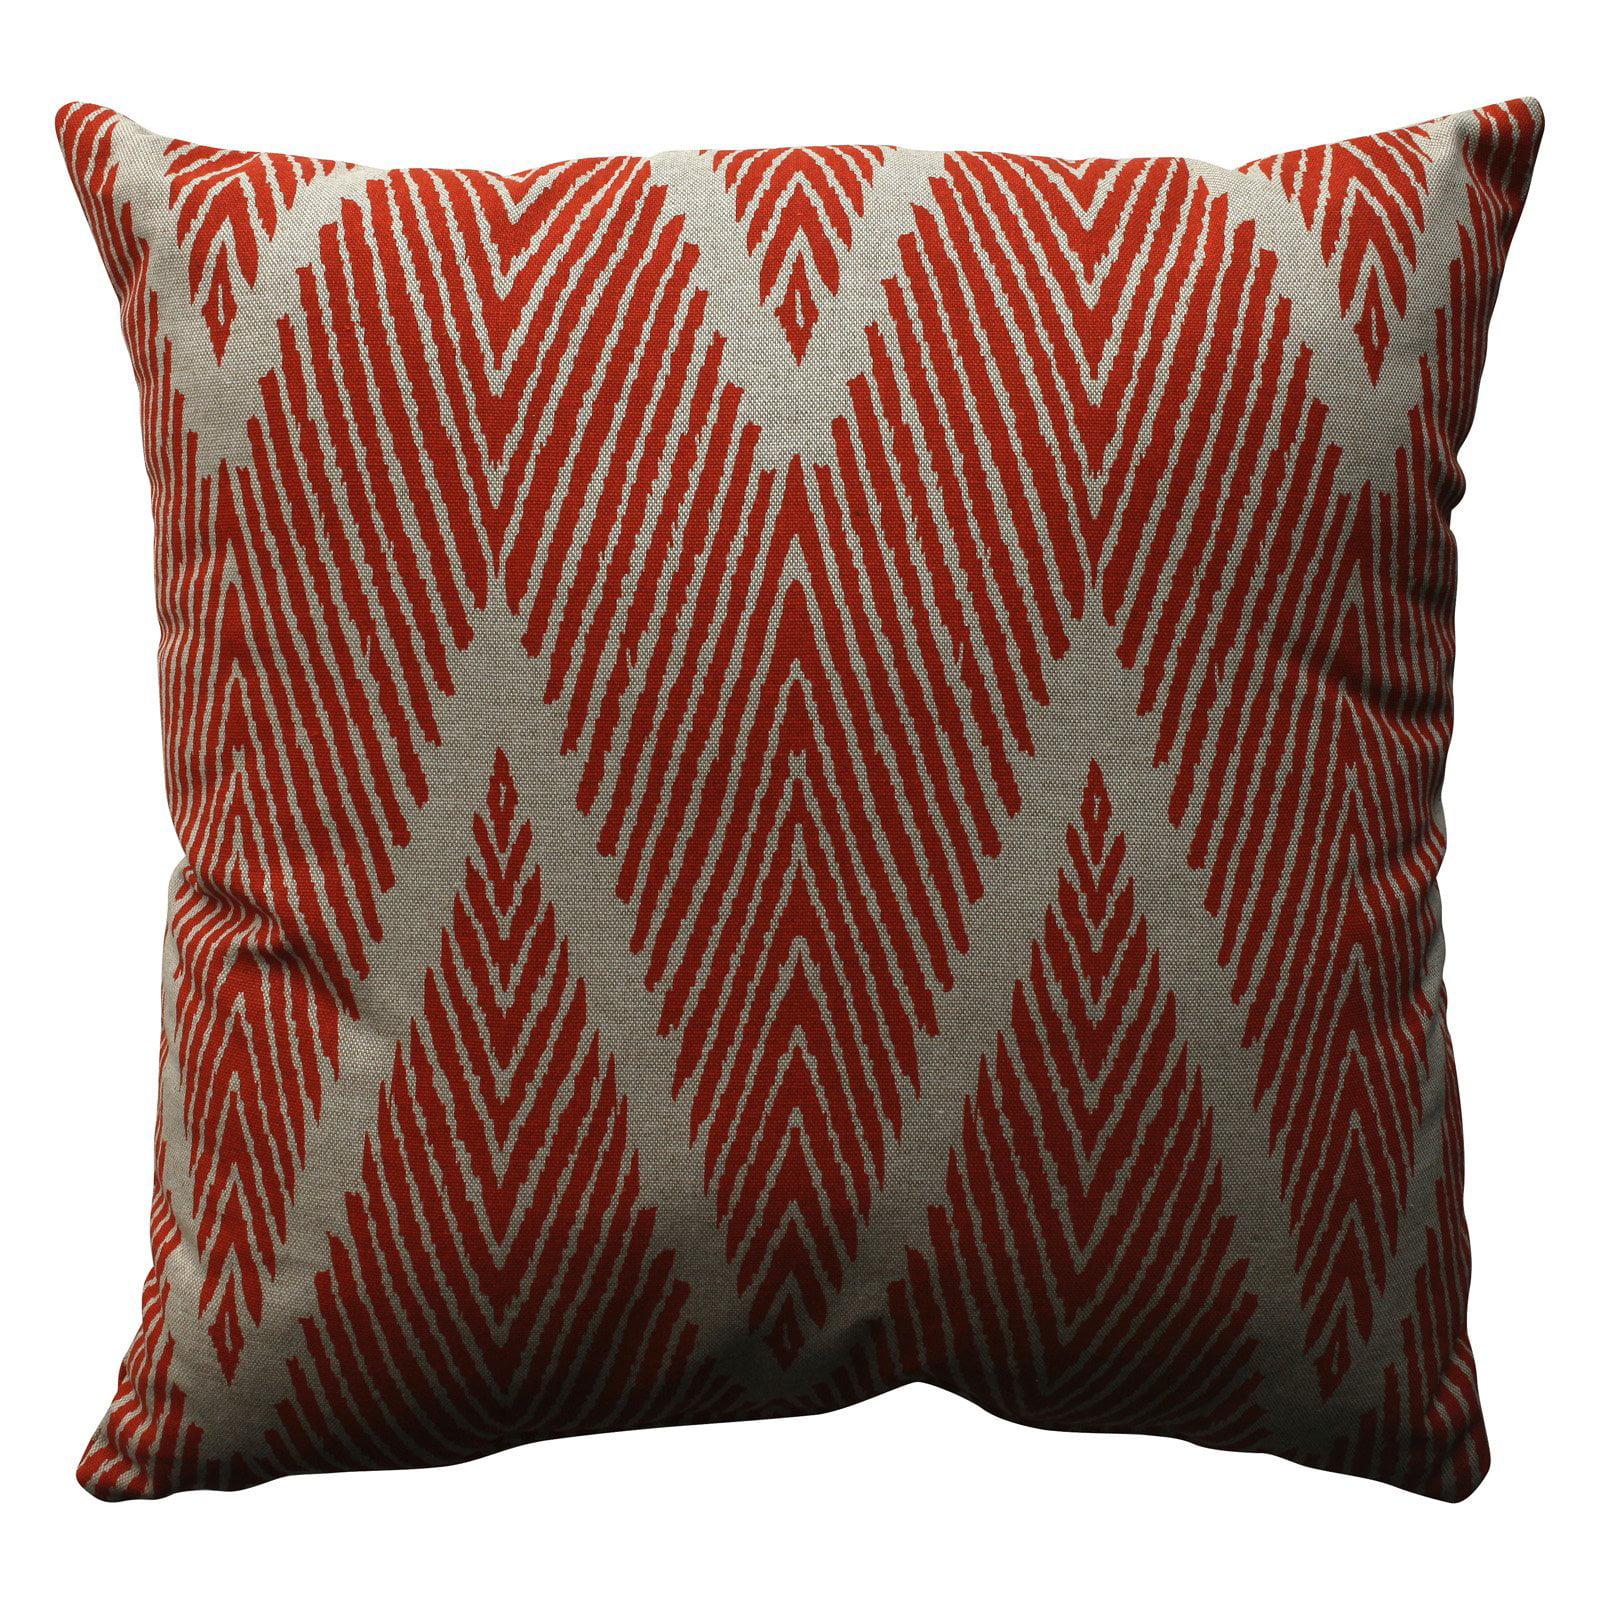 Pillow Perfect Bali Zig Zag Throw Pillow